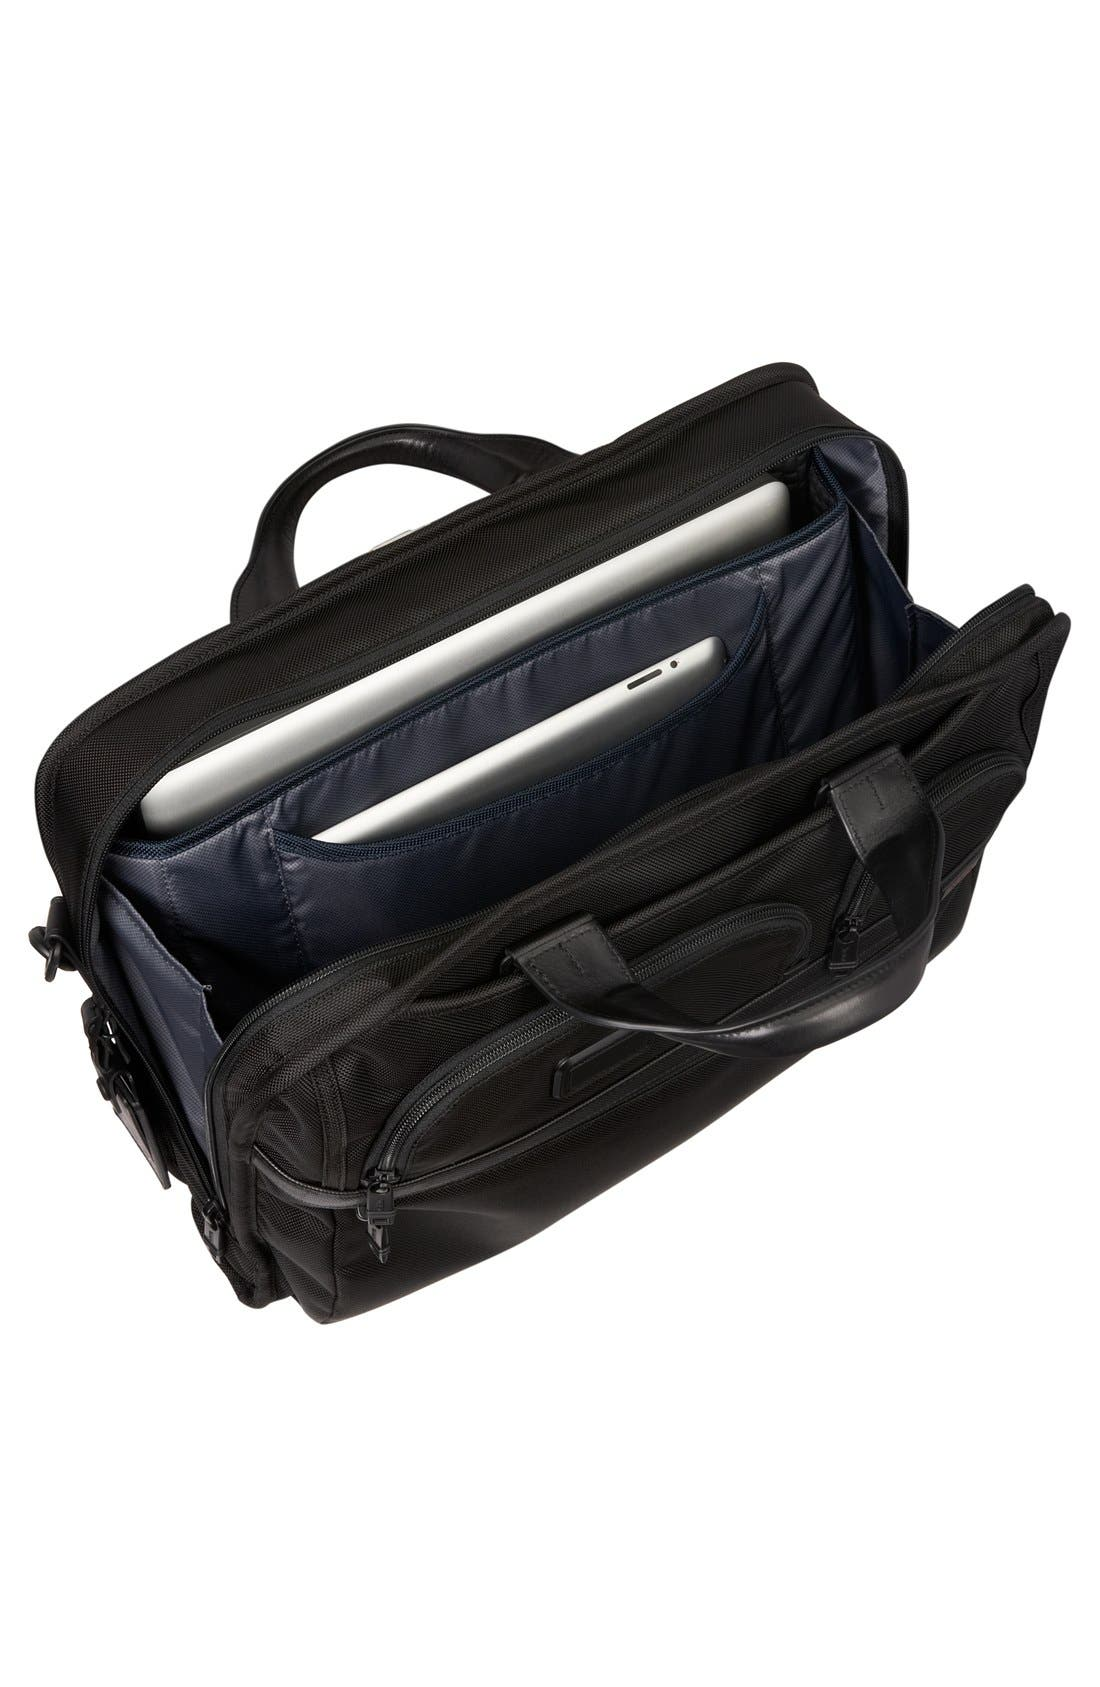 Alternate Image 2  - Tumi 'Alpha 2' Laptop Briefcase with Tumi ID Lock Pocket